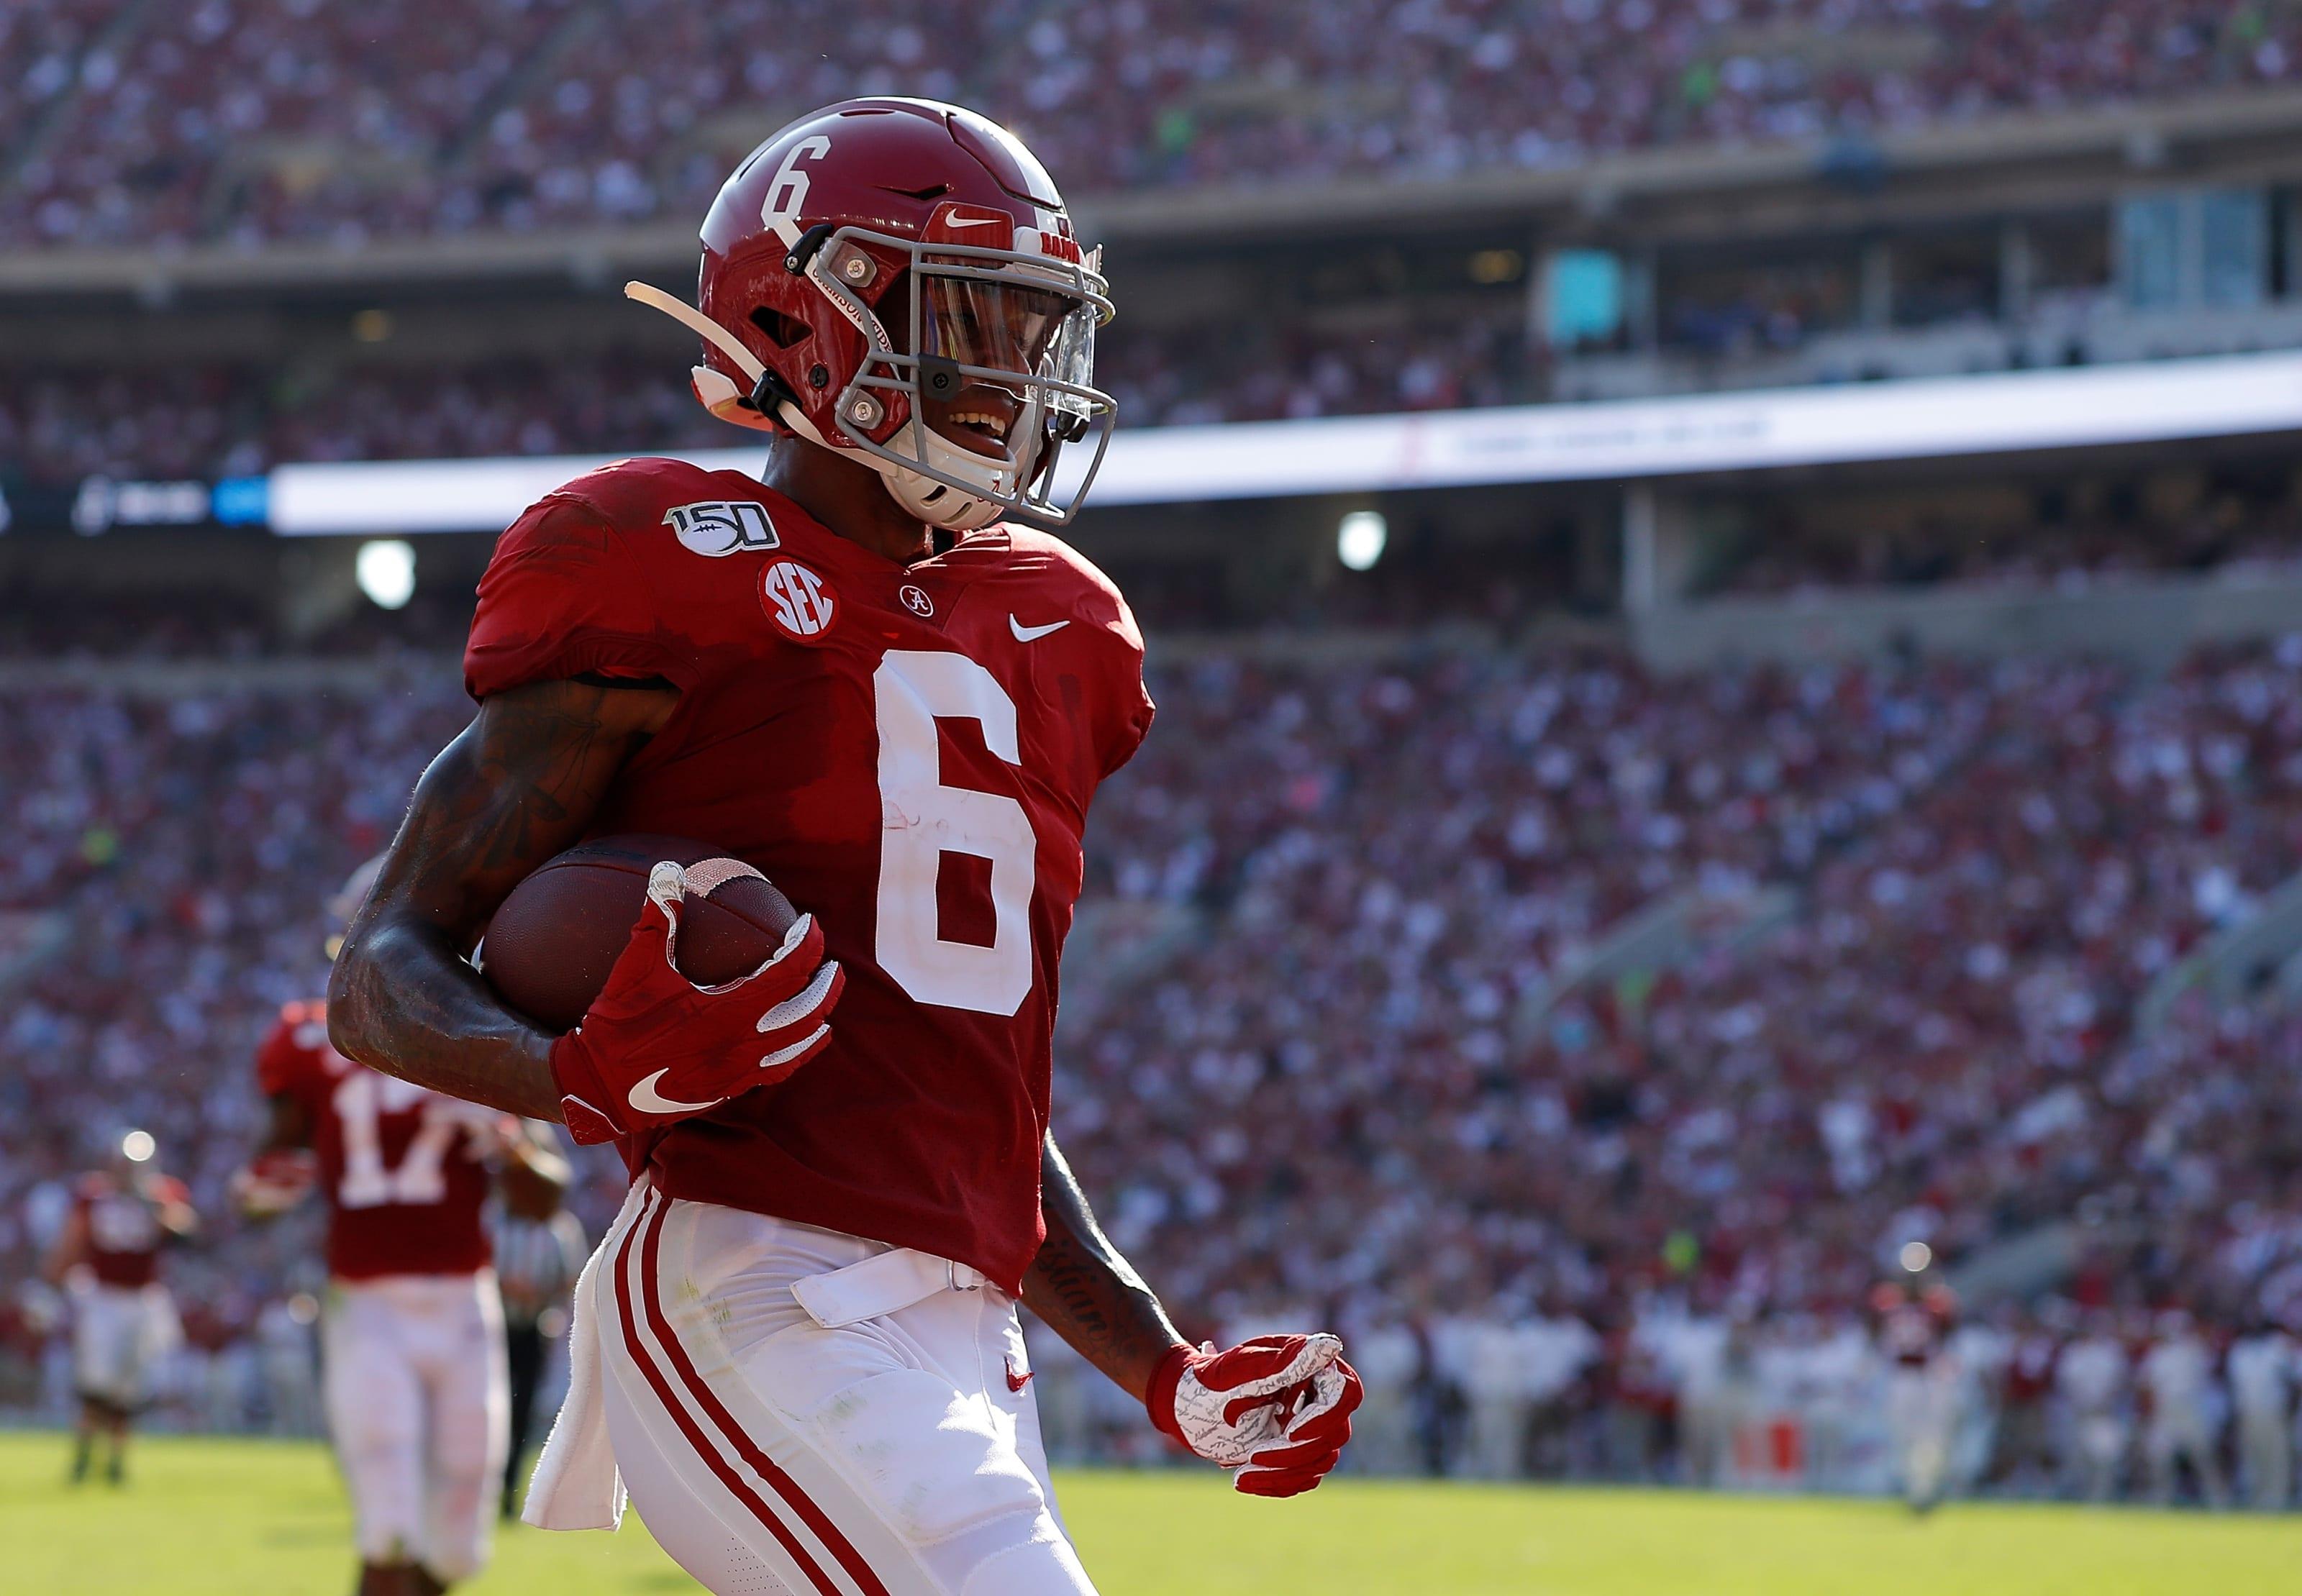 2021 NFL Draft prospect DeVonta Smith